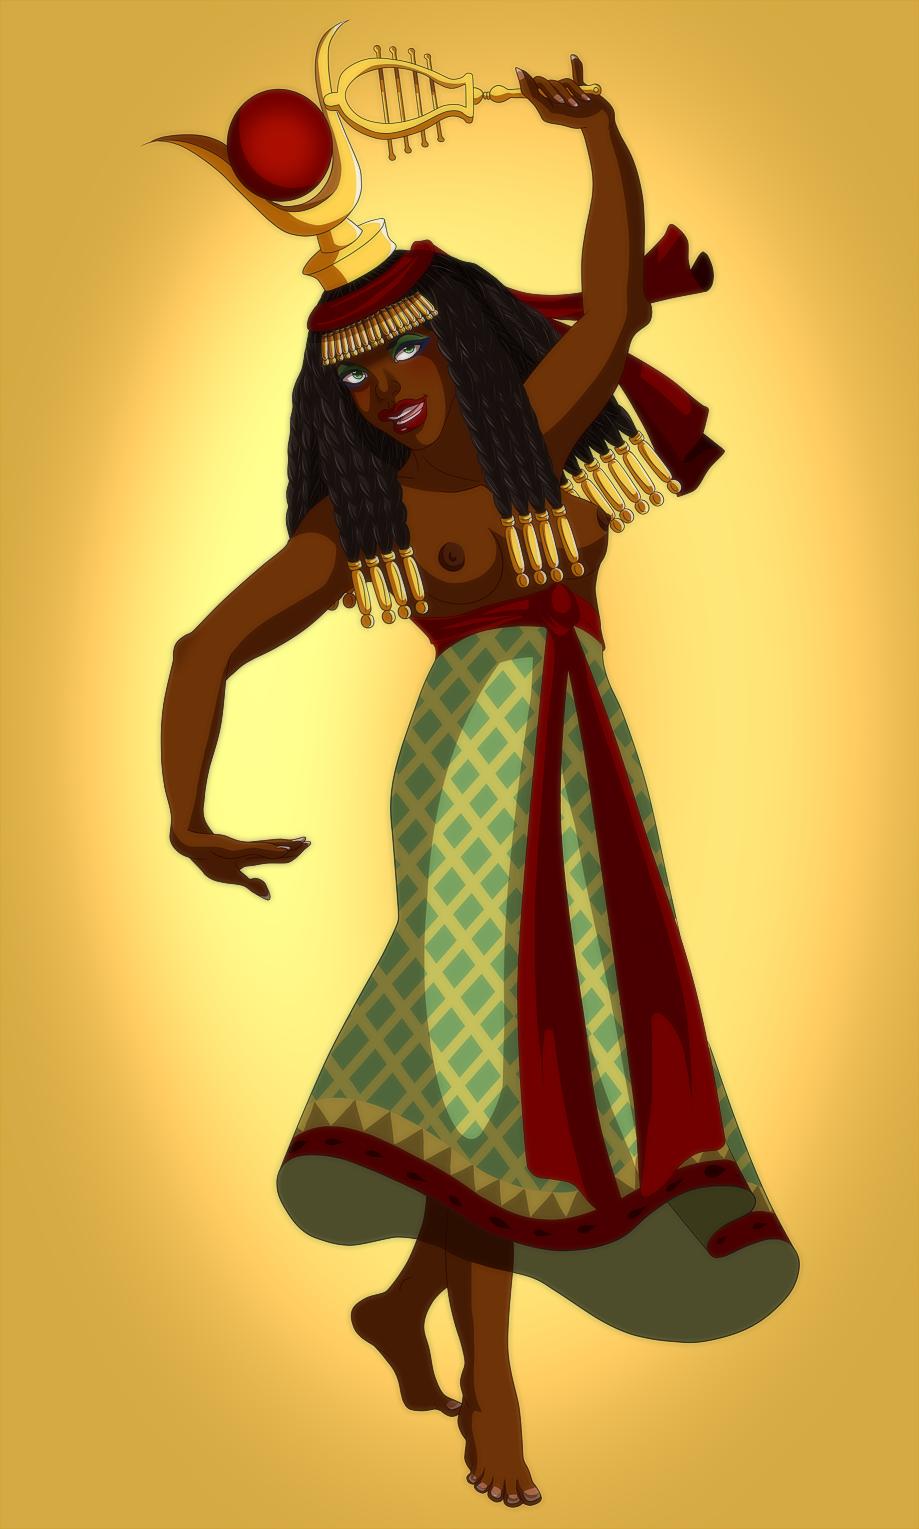 Character Design Challenge Deviantart : Hathor character design challenge by lounabis on deviantart